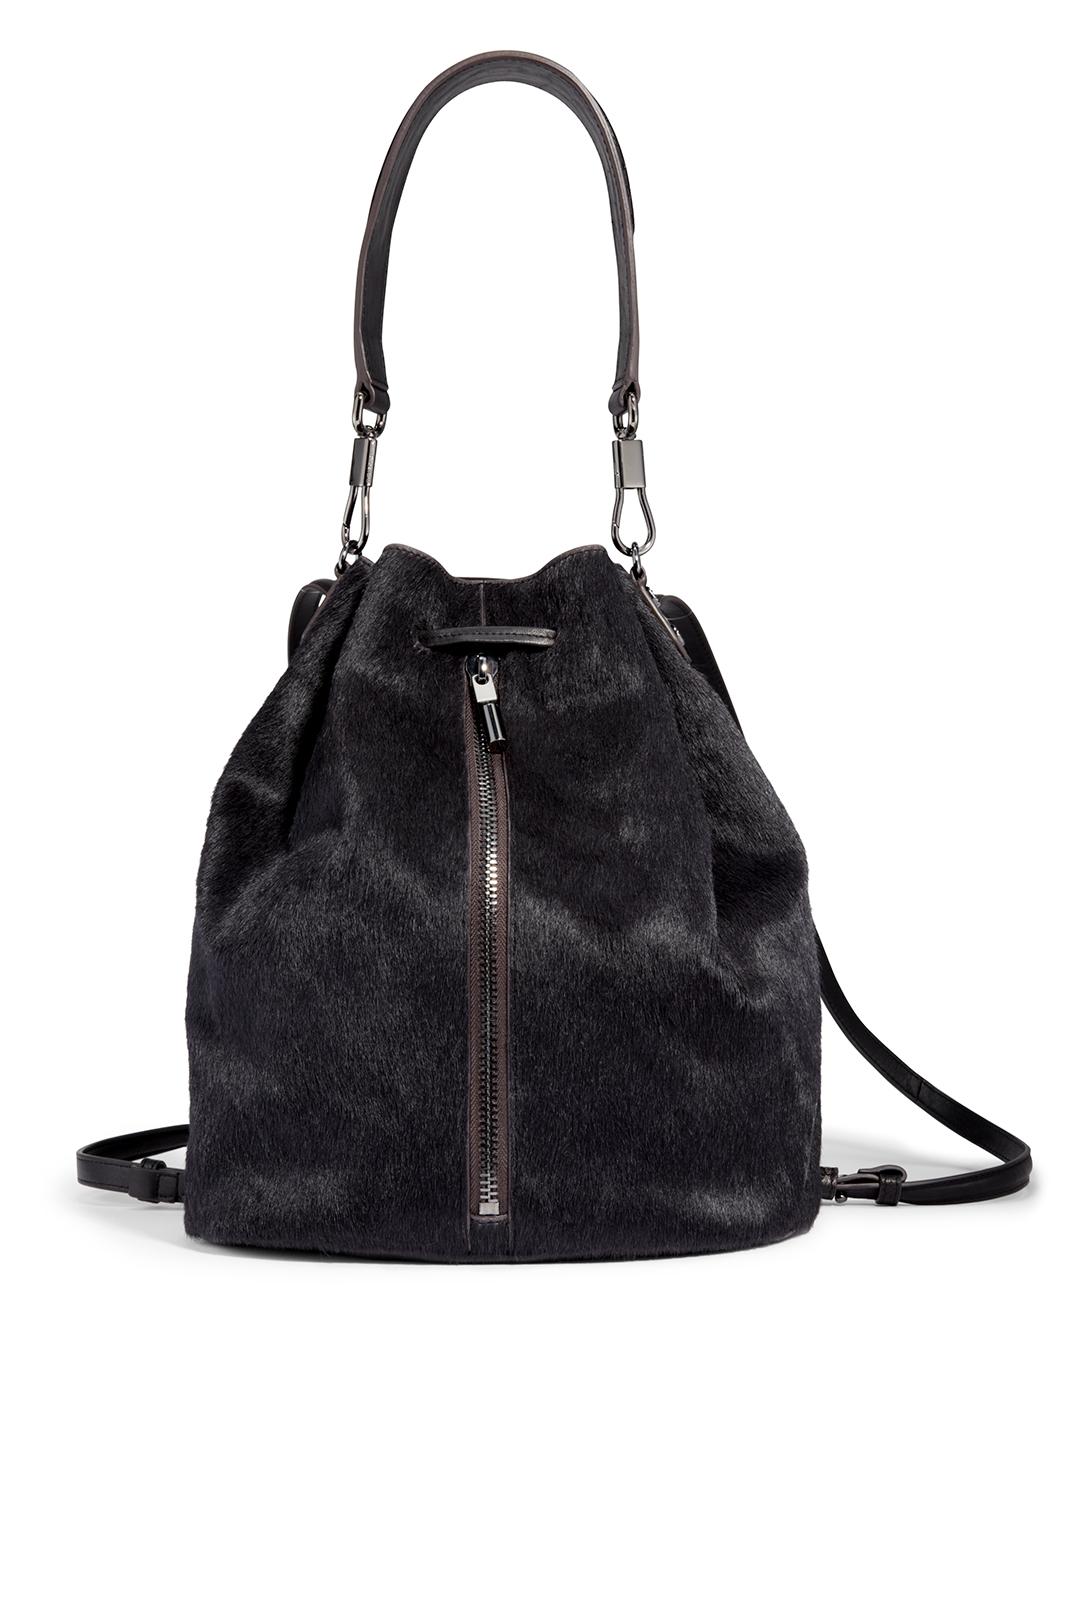 Elizabeth and James Bucket Bag